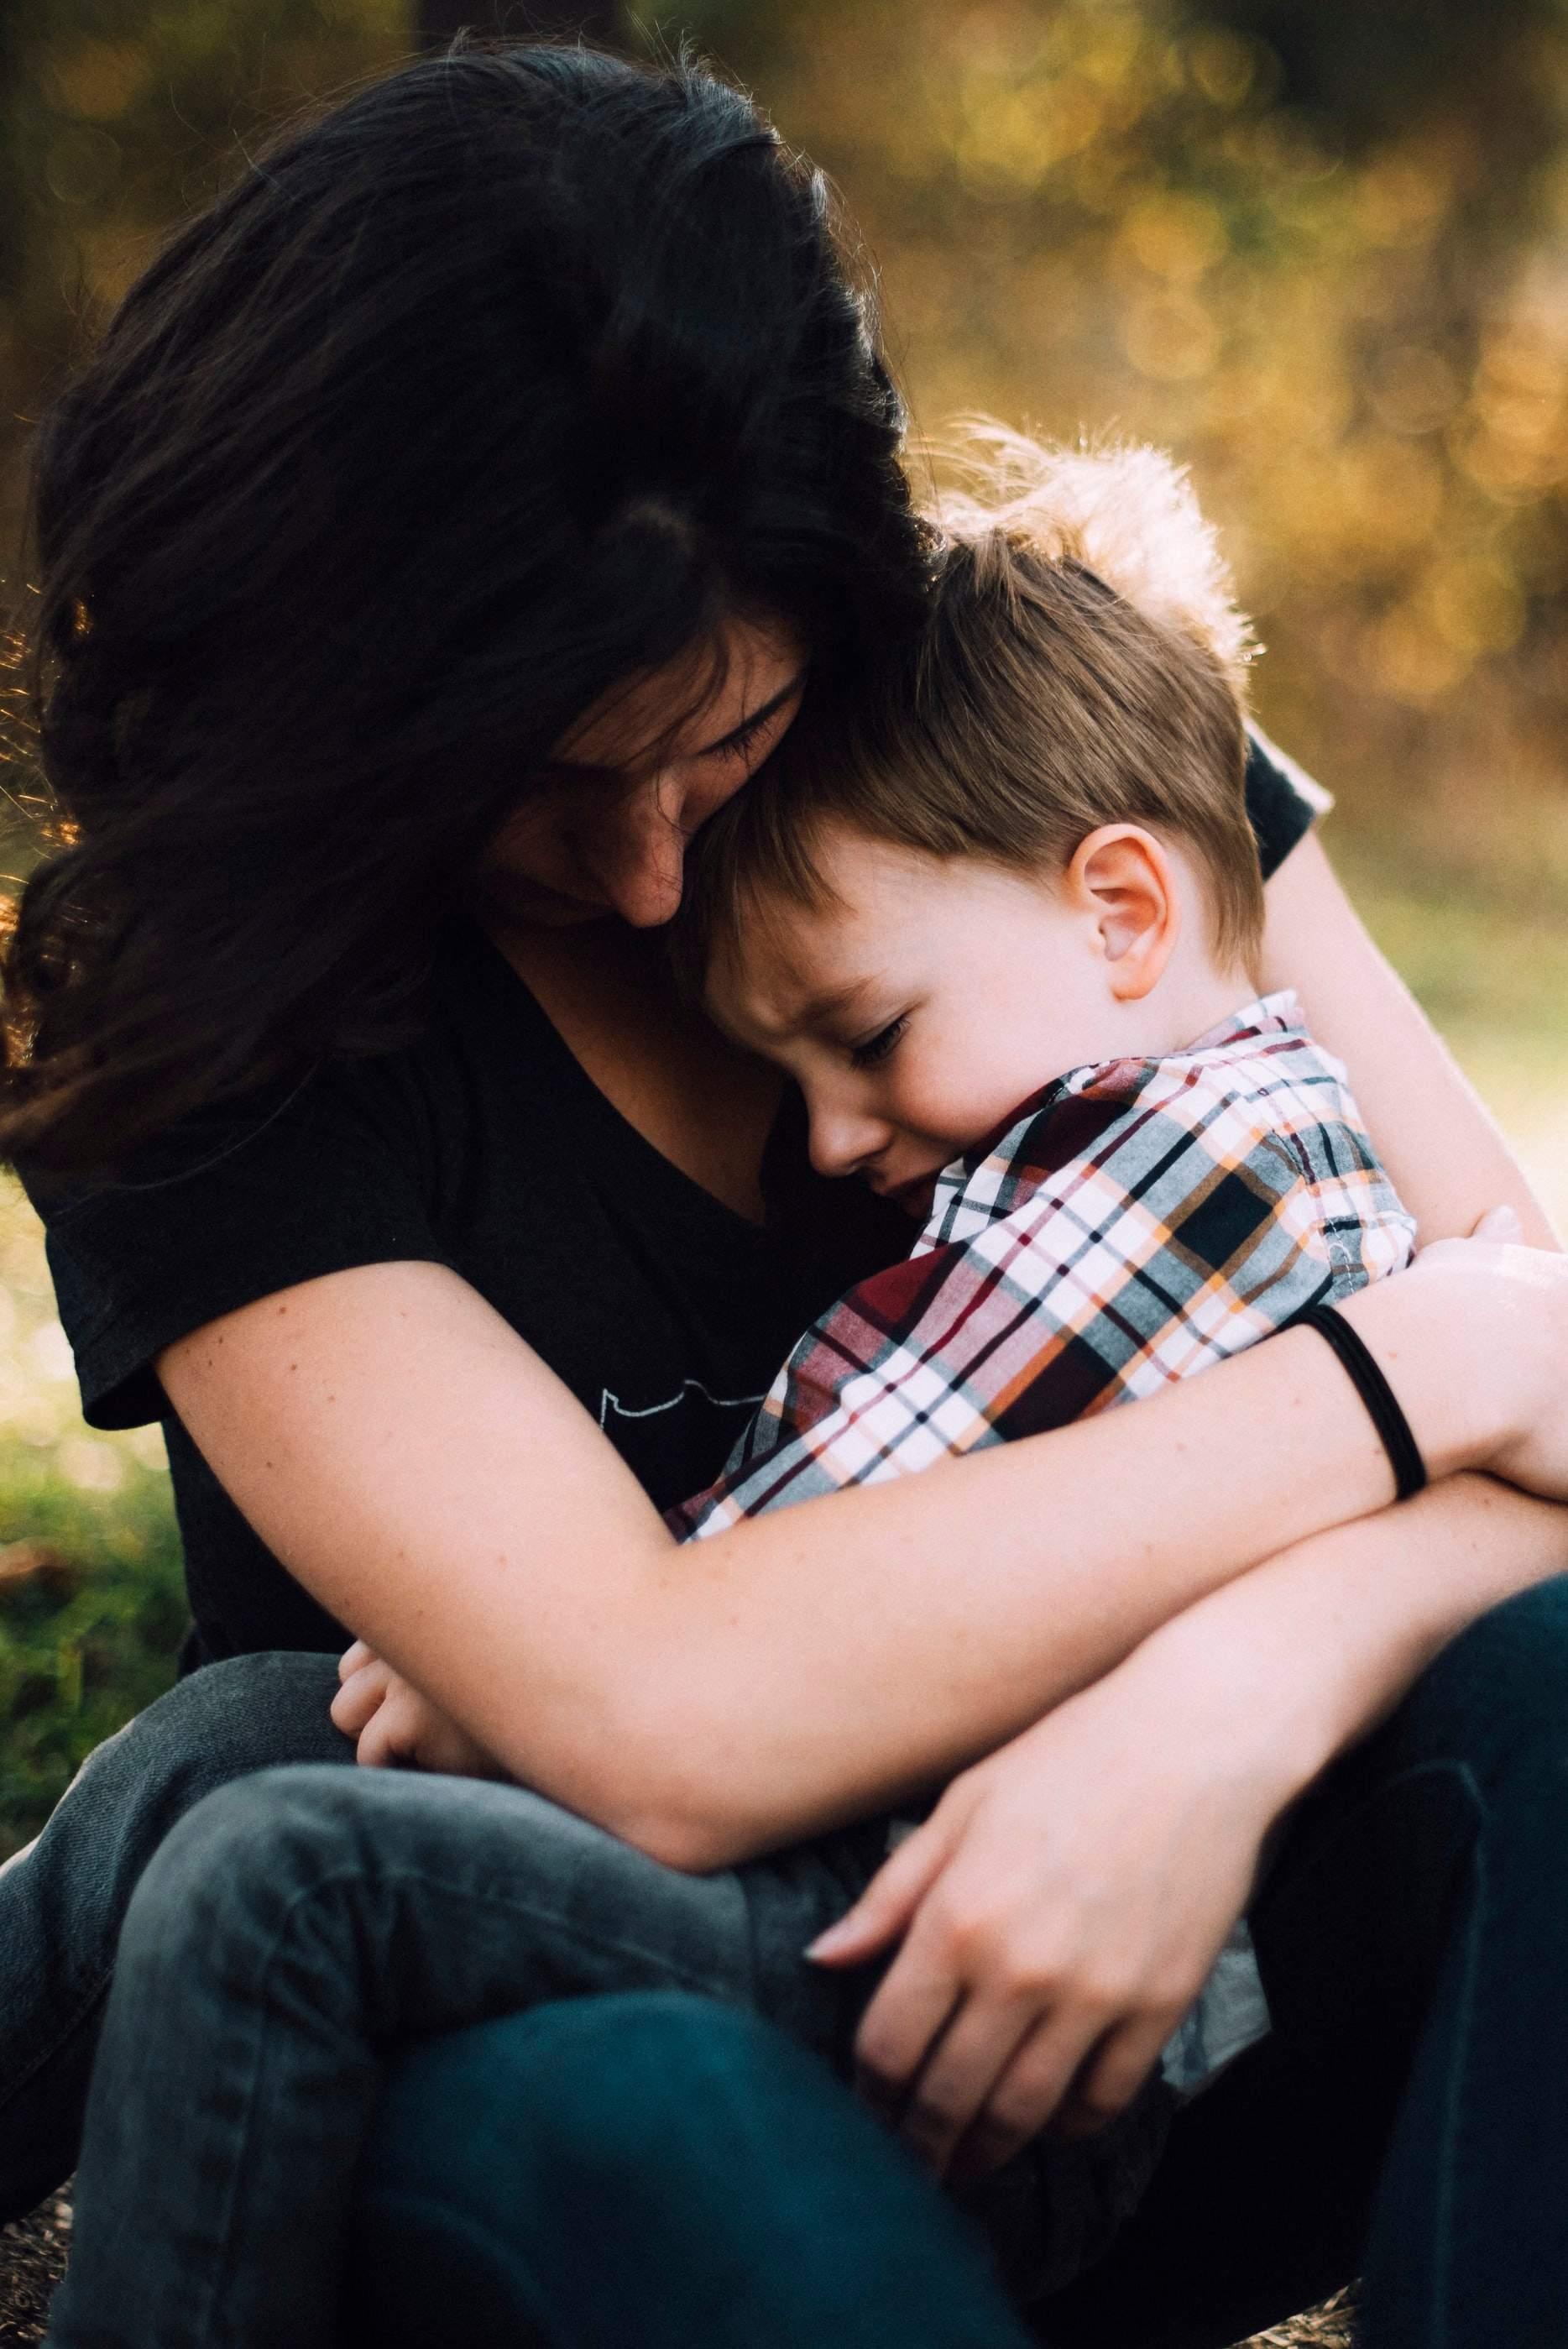 Як реагувати на плач дитини